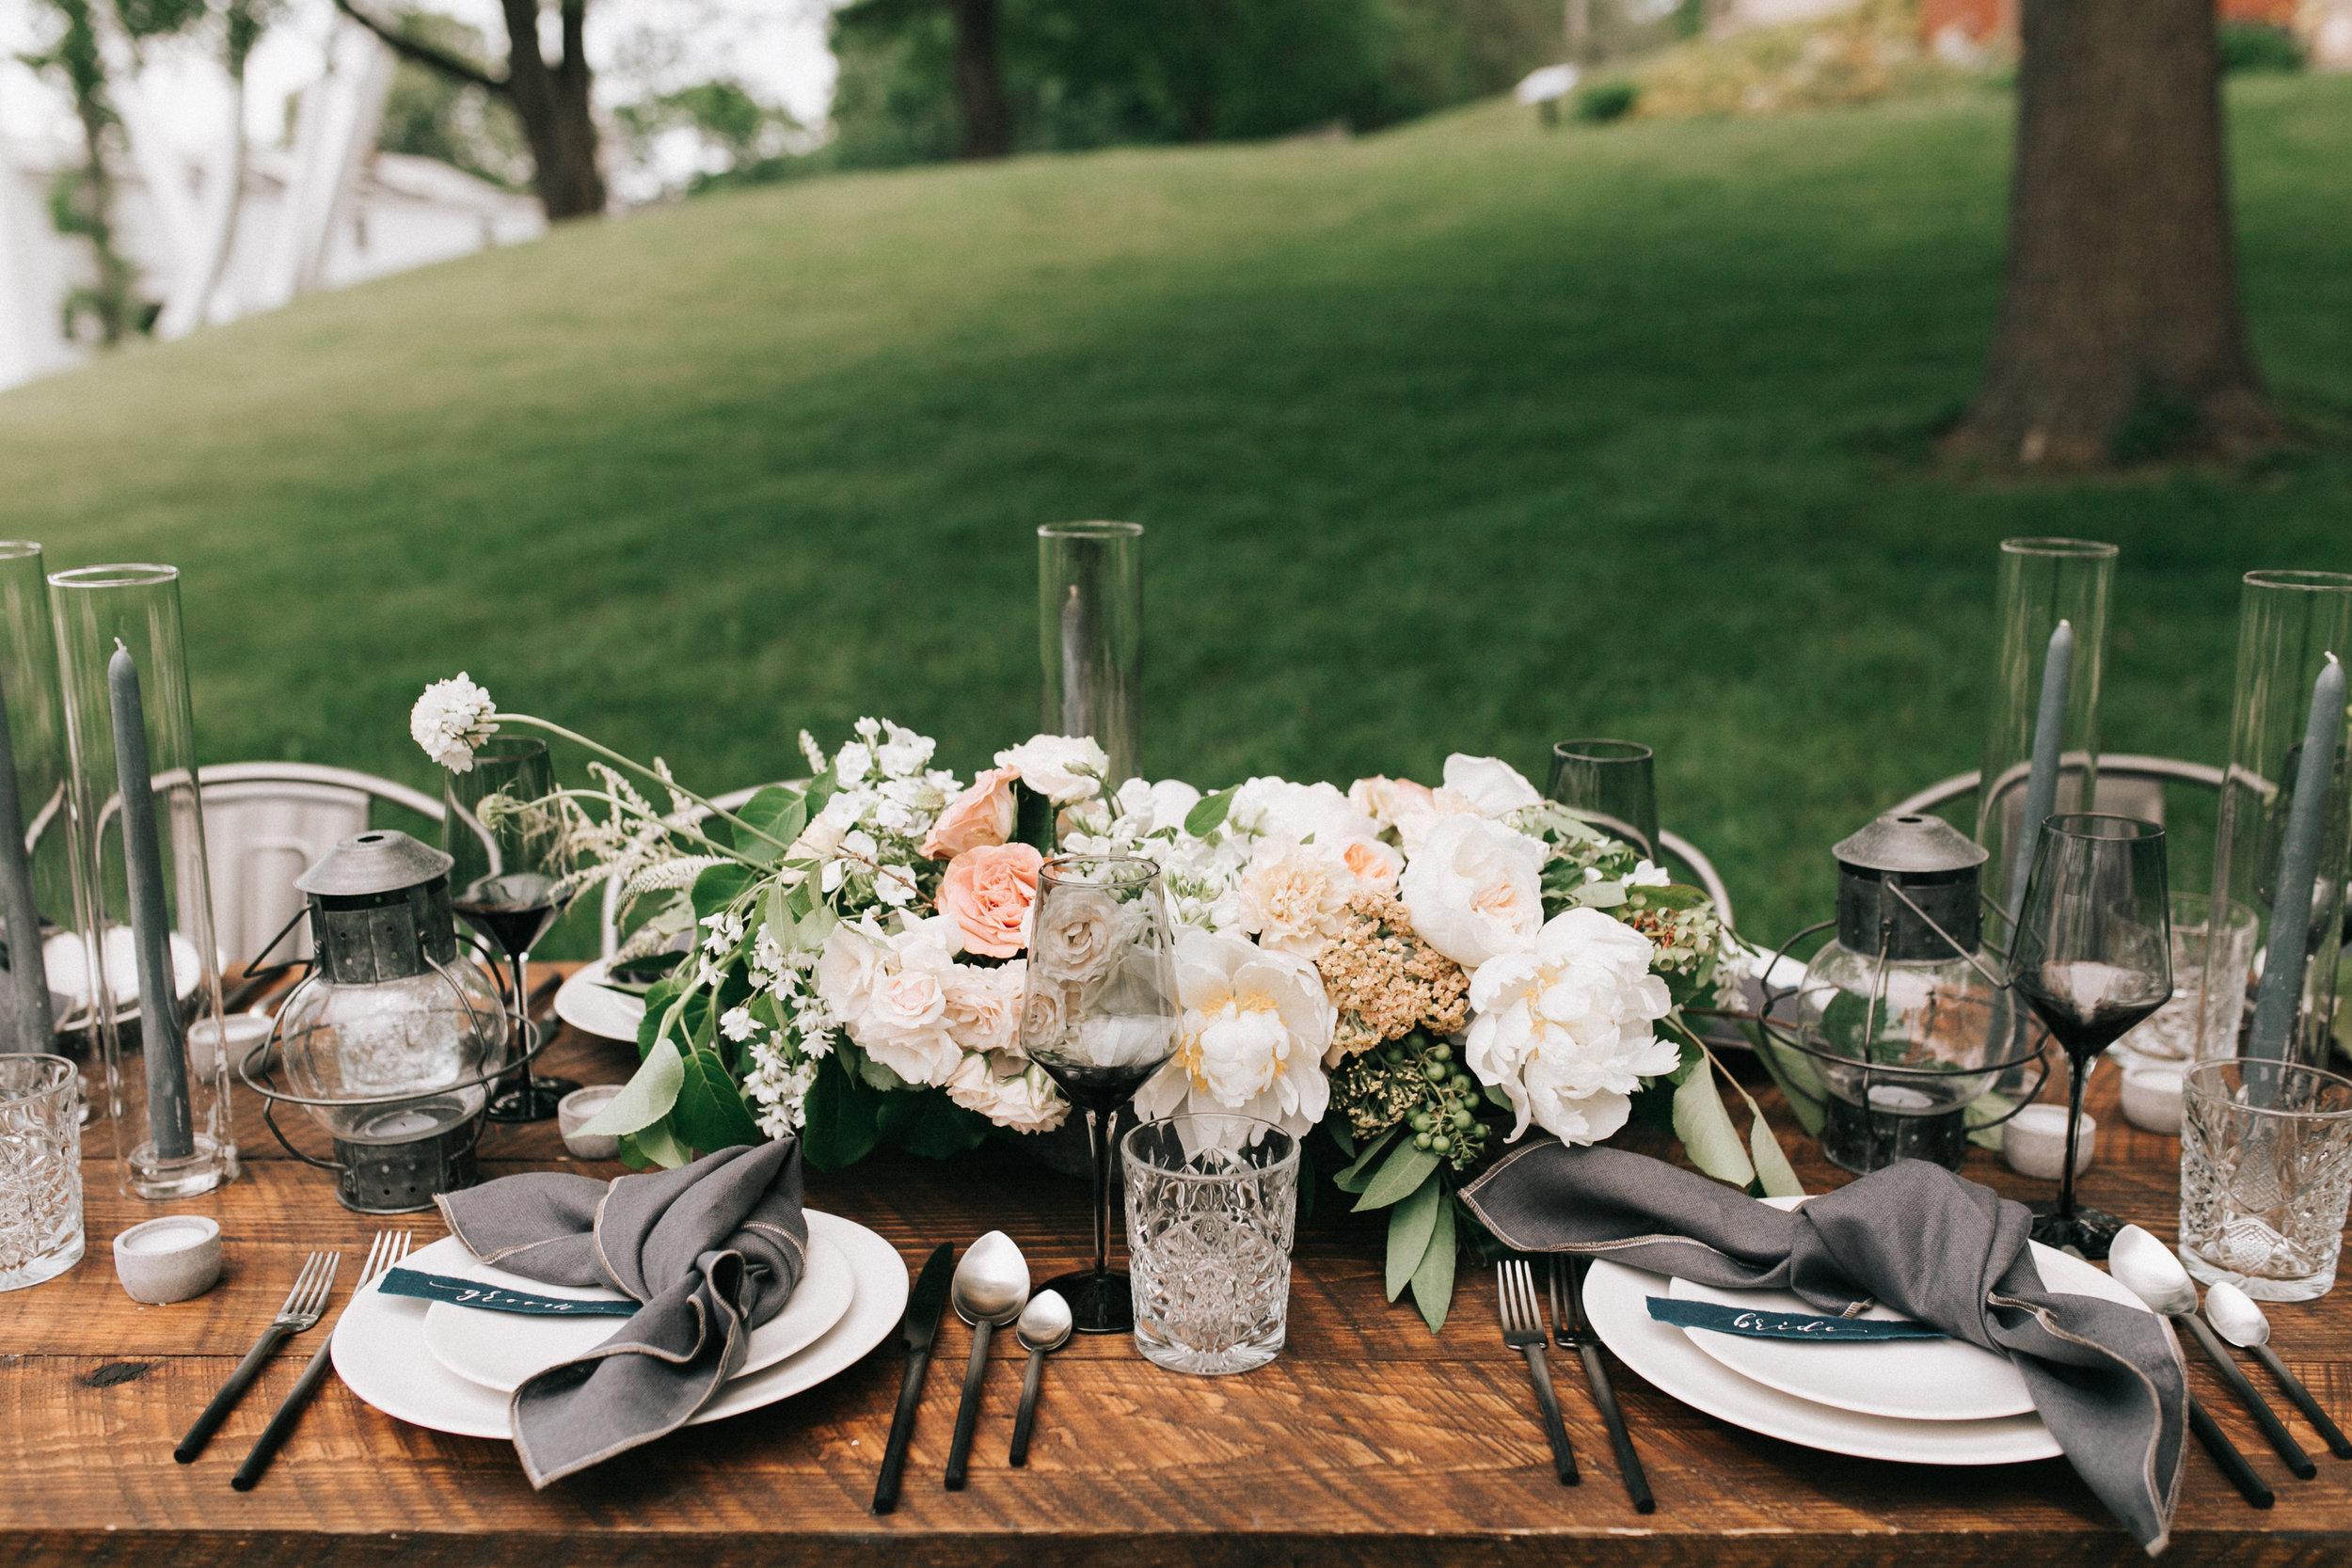 Watershed-Floral-Maine-Maritime-Wedding-Bridal-Bouquet-Centerpieces-0058.jpg